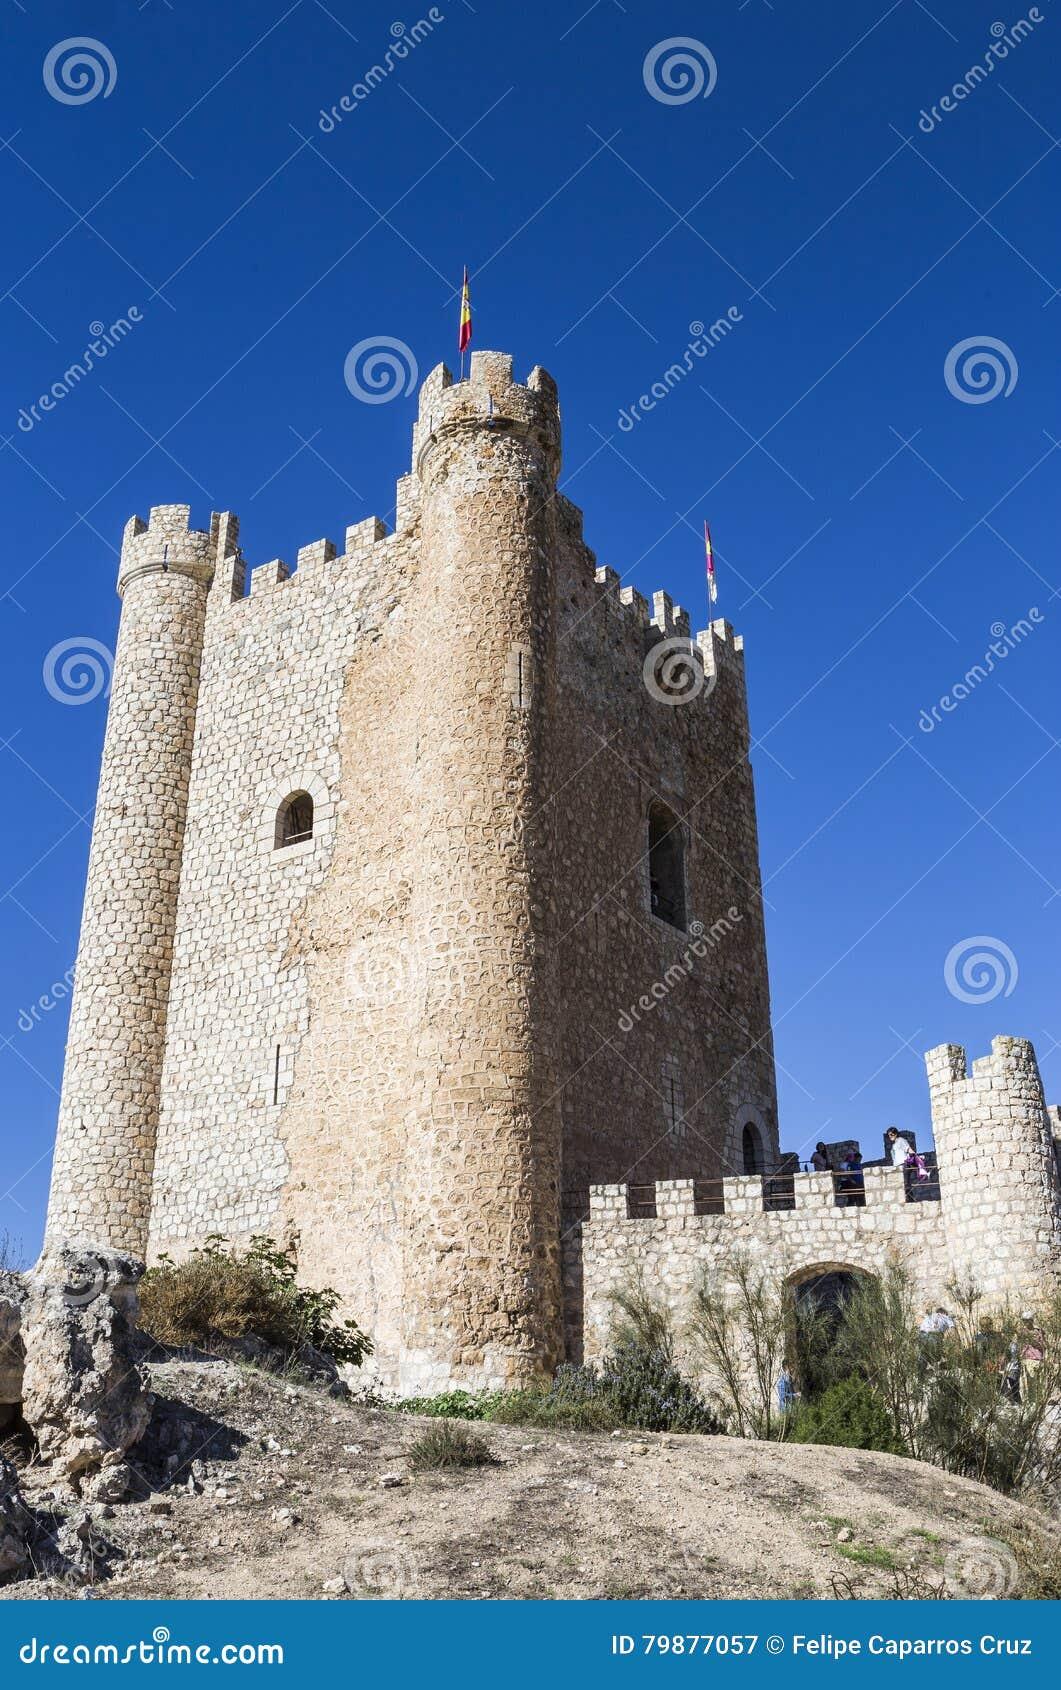 Замок начала Almohad столетия XII, взятие в Alcala t